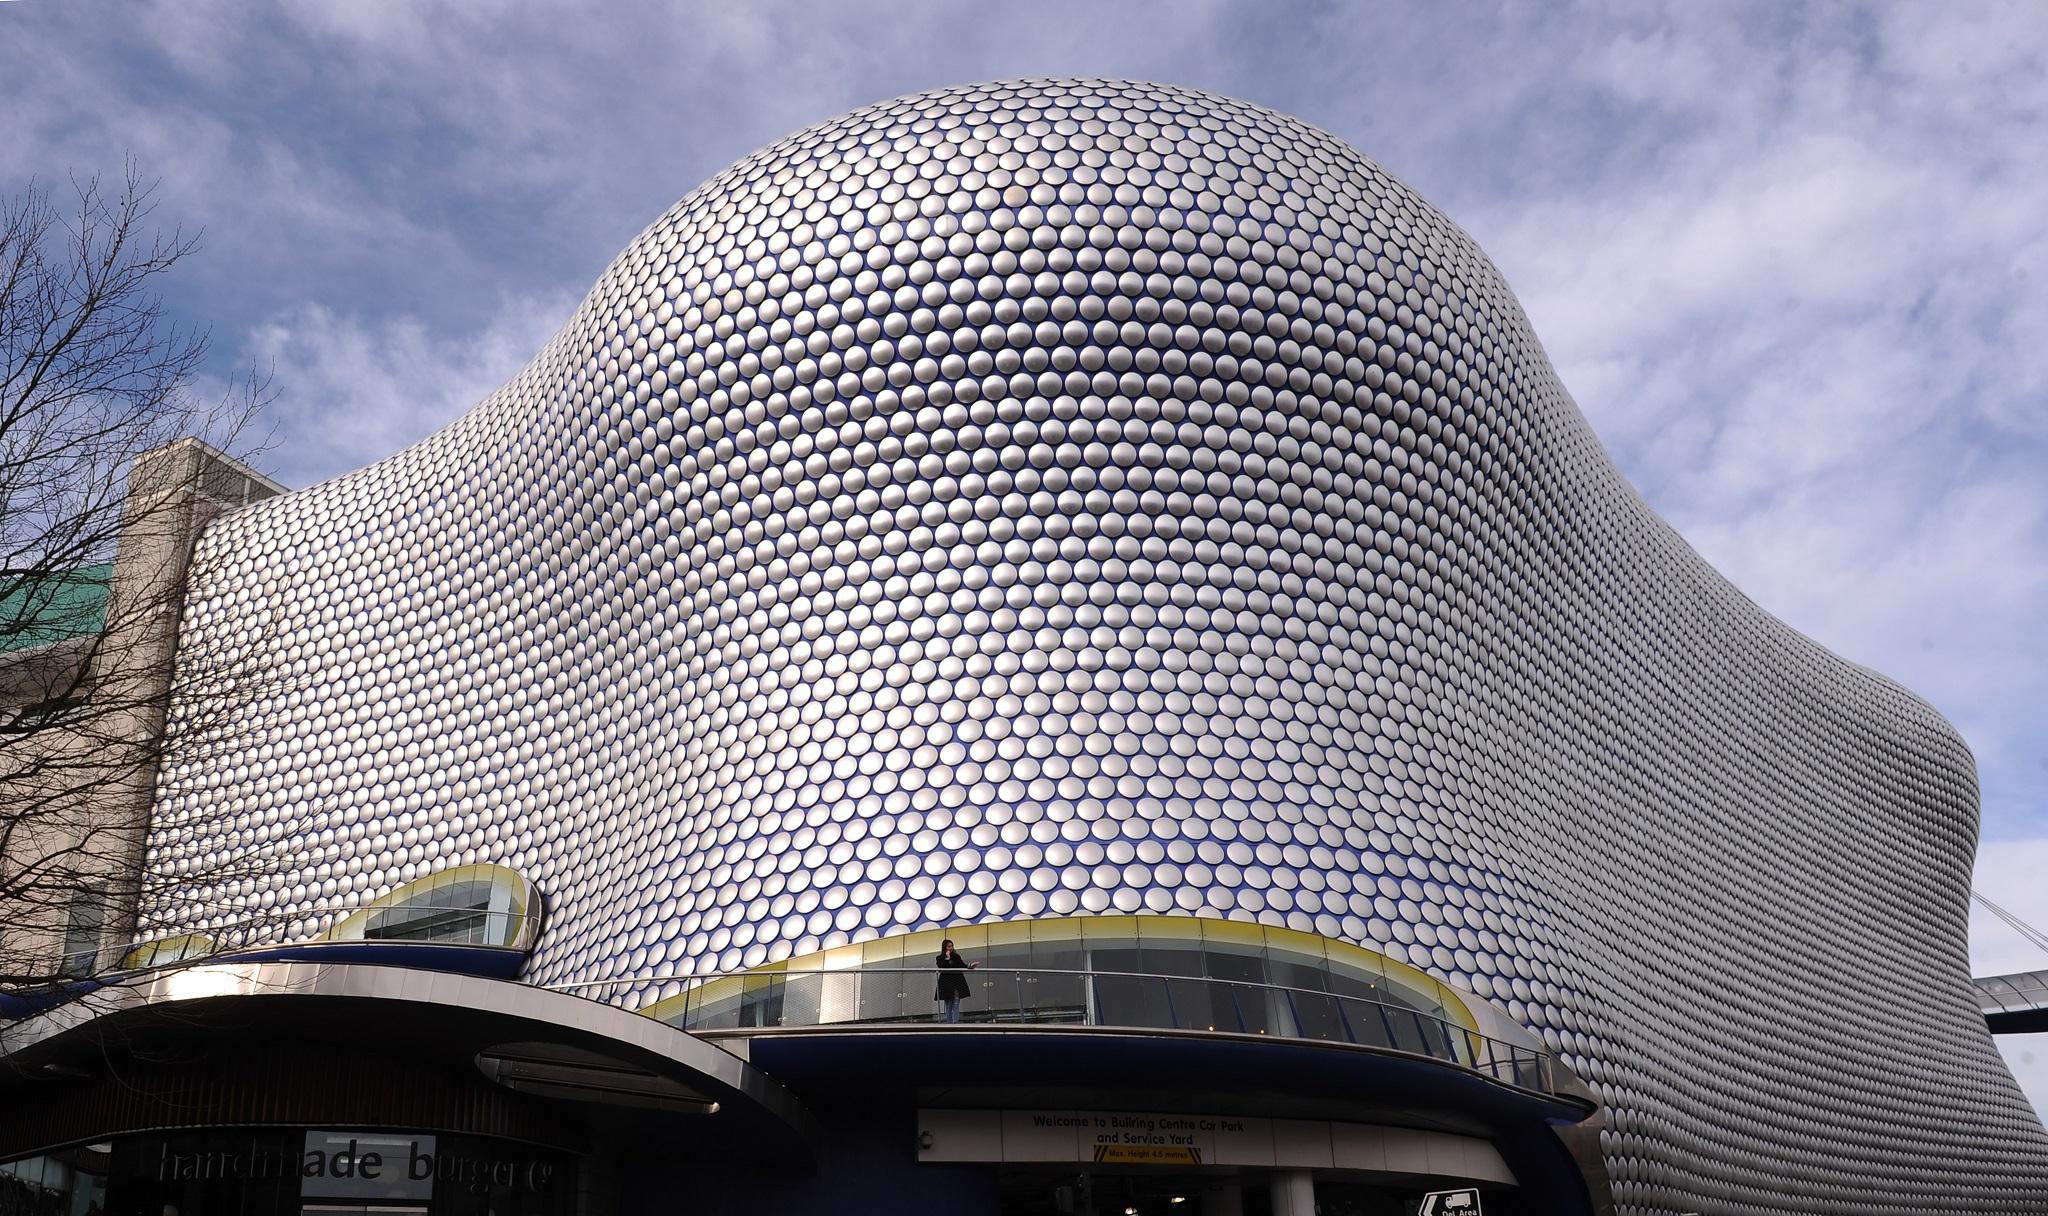 The Bullring centre in Birmingham